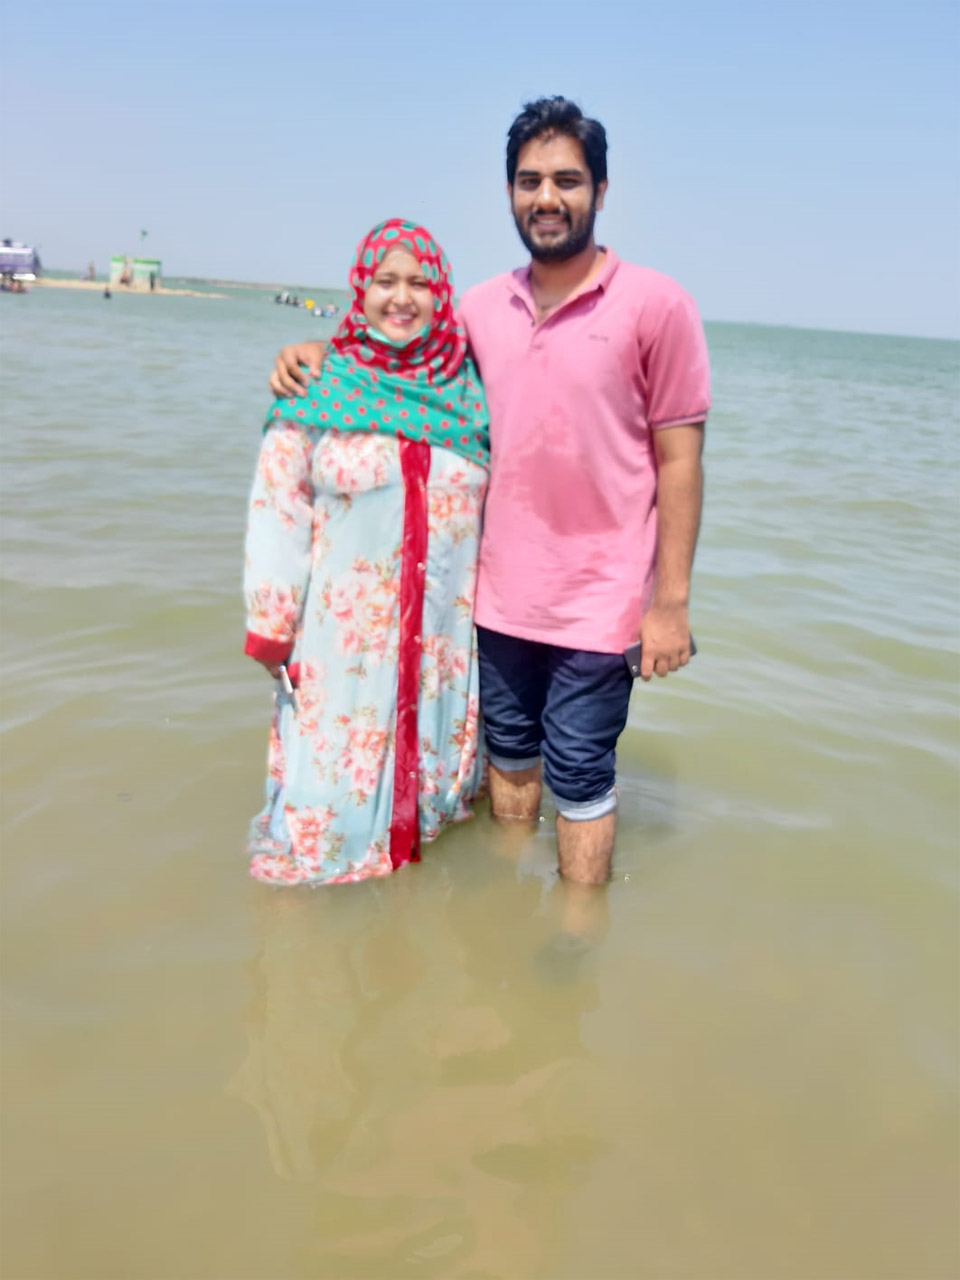 Taha and Samia enjoying the cold water of the lake.